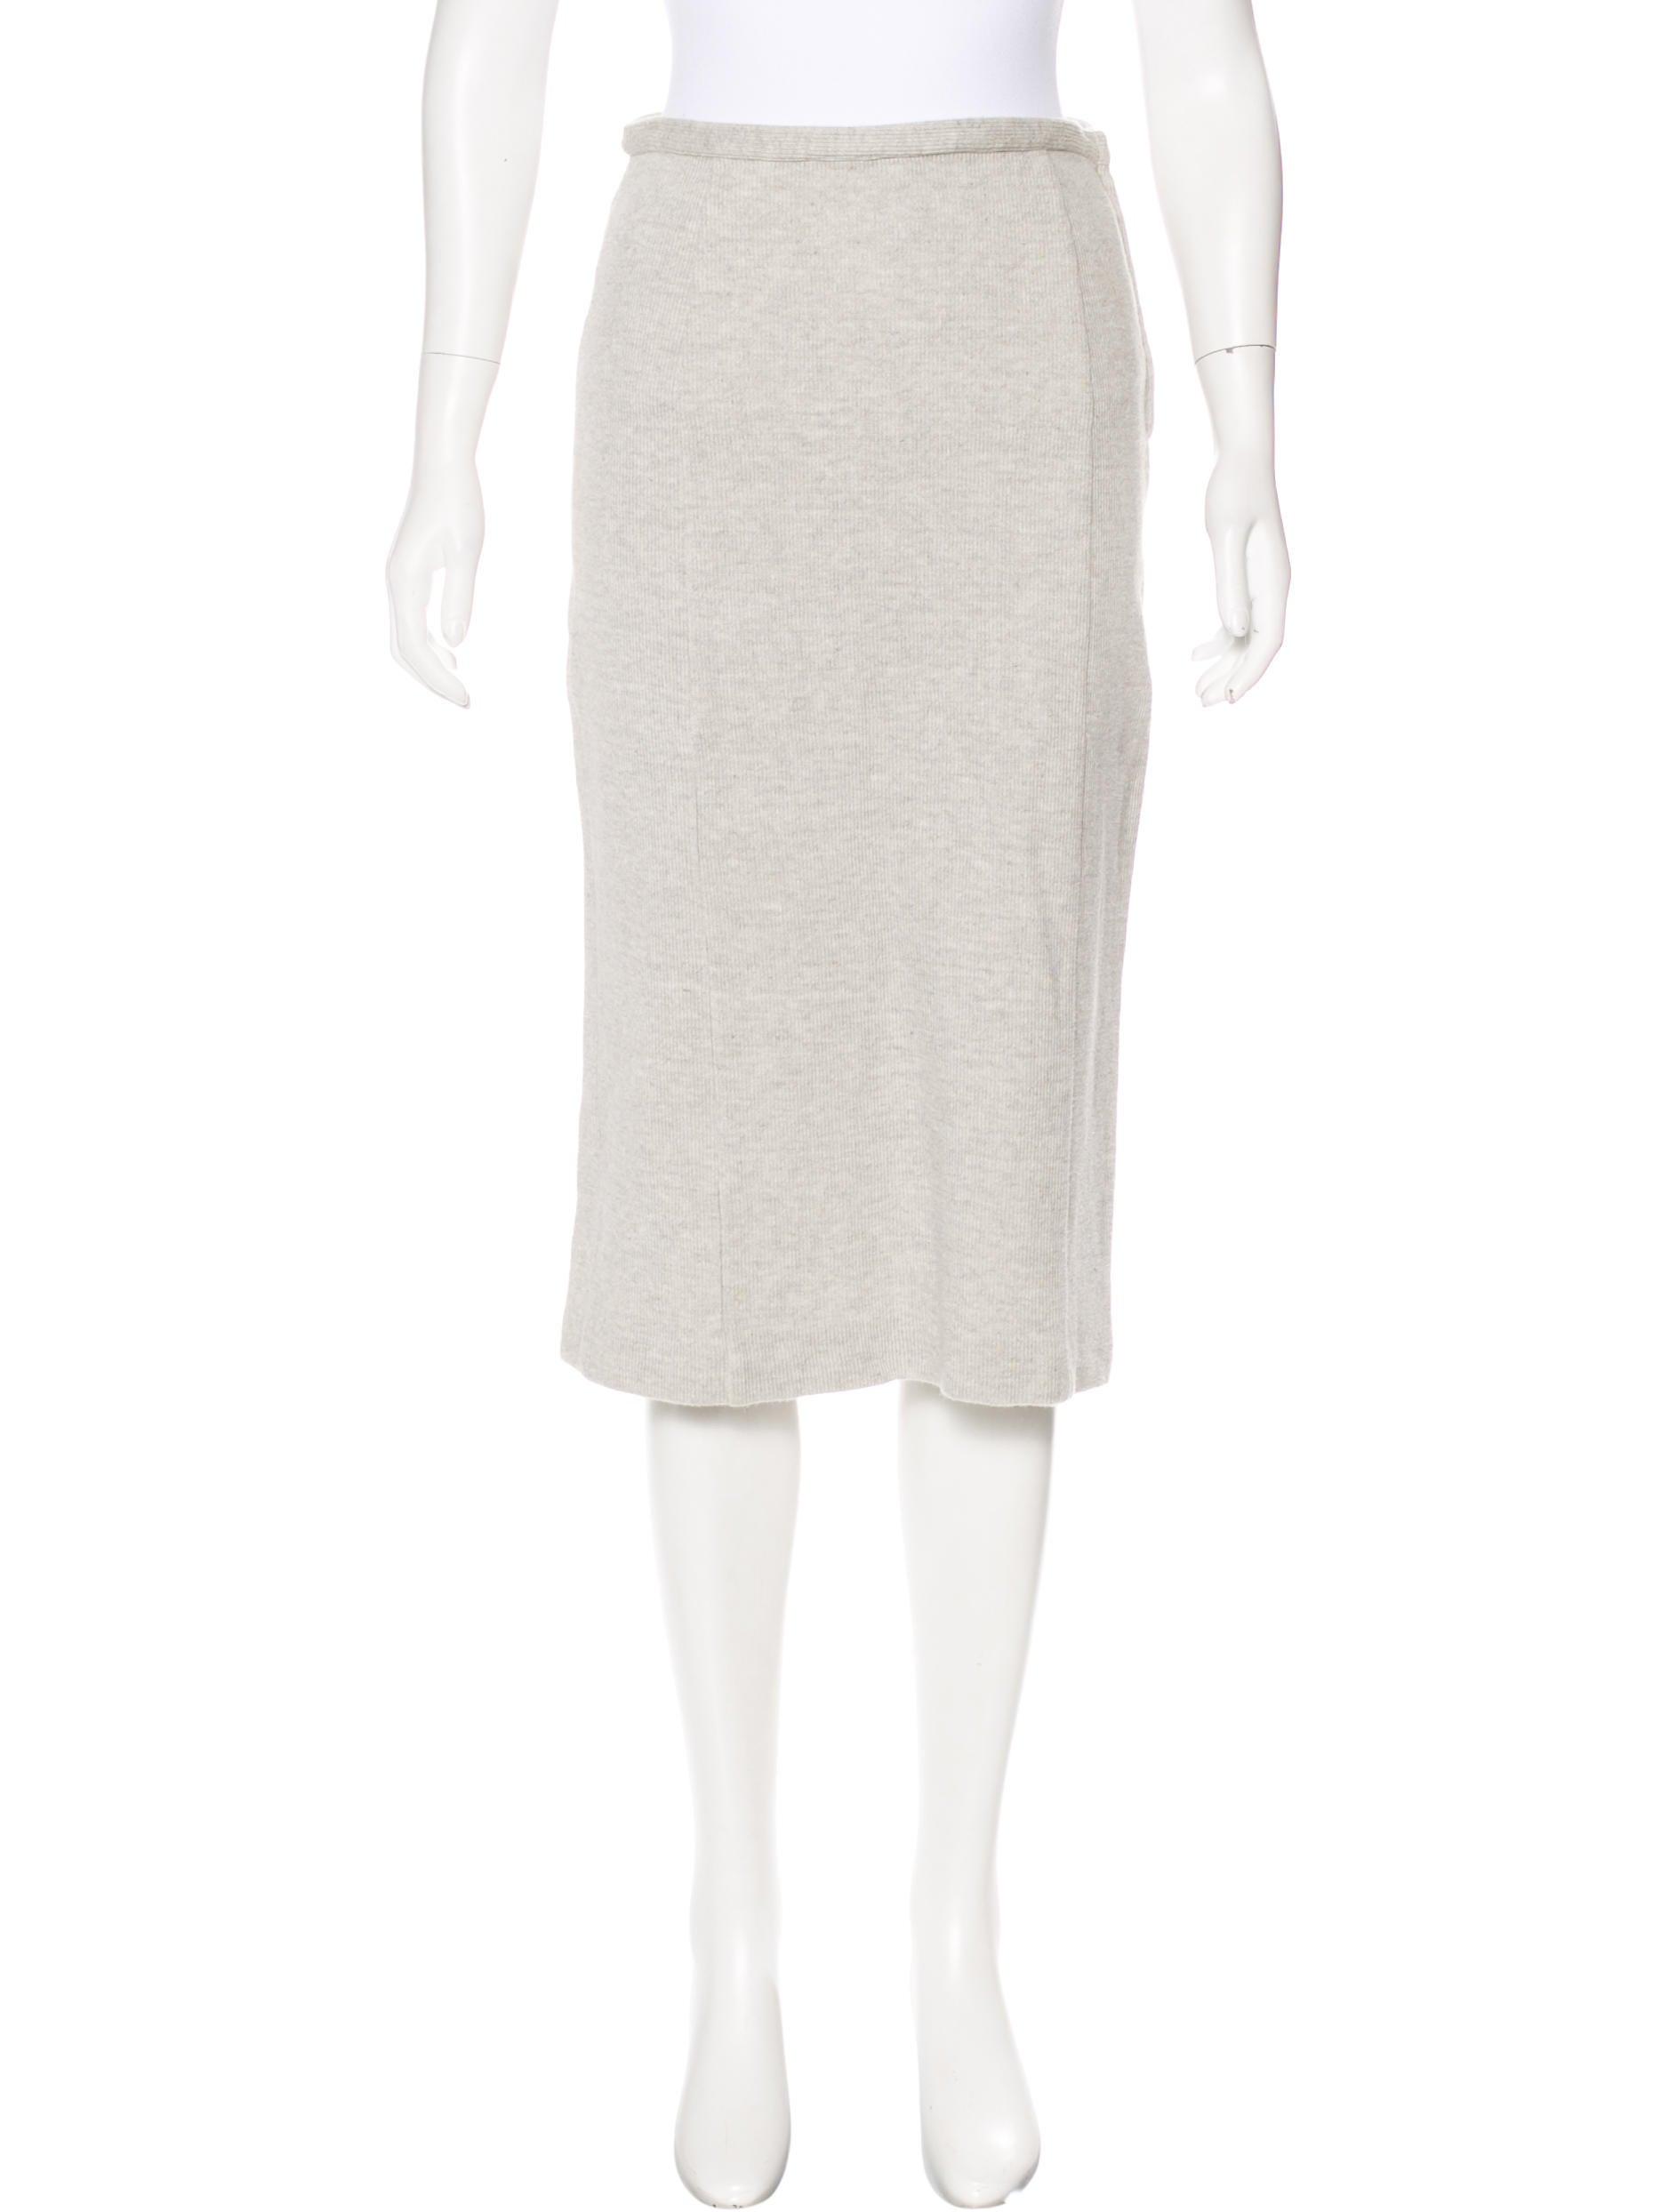 Miu Miu Rib Knit Pencil Skirt - Clothing - MIU54990 | The ...